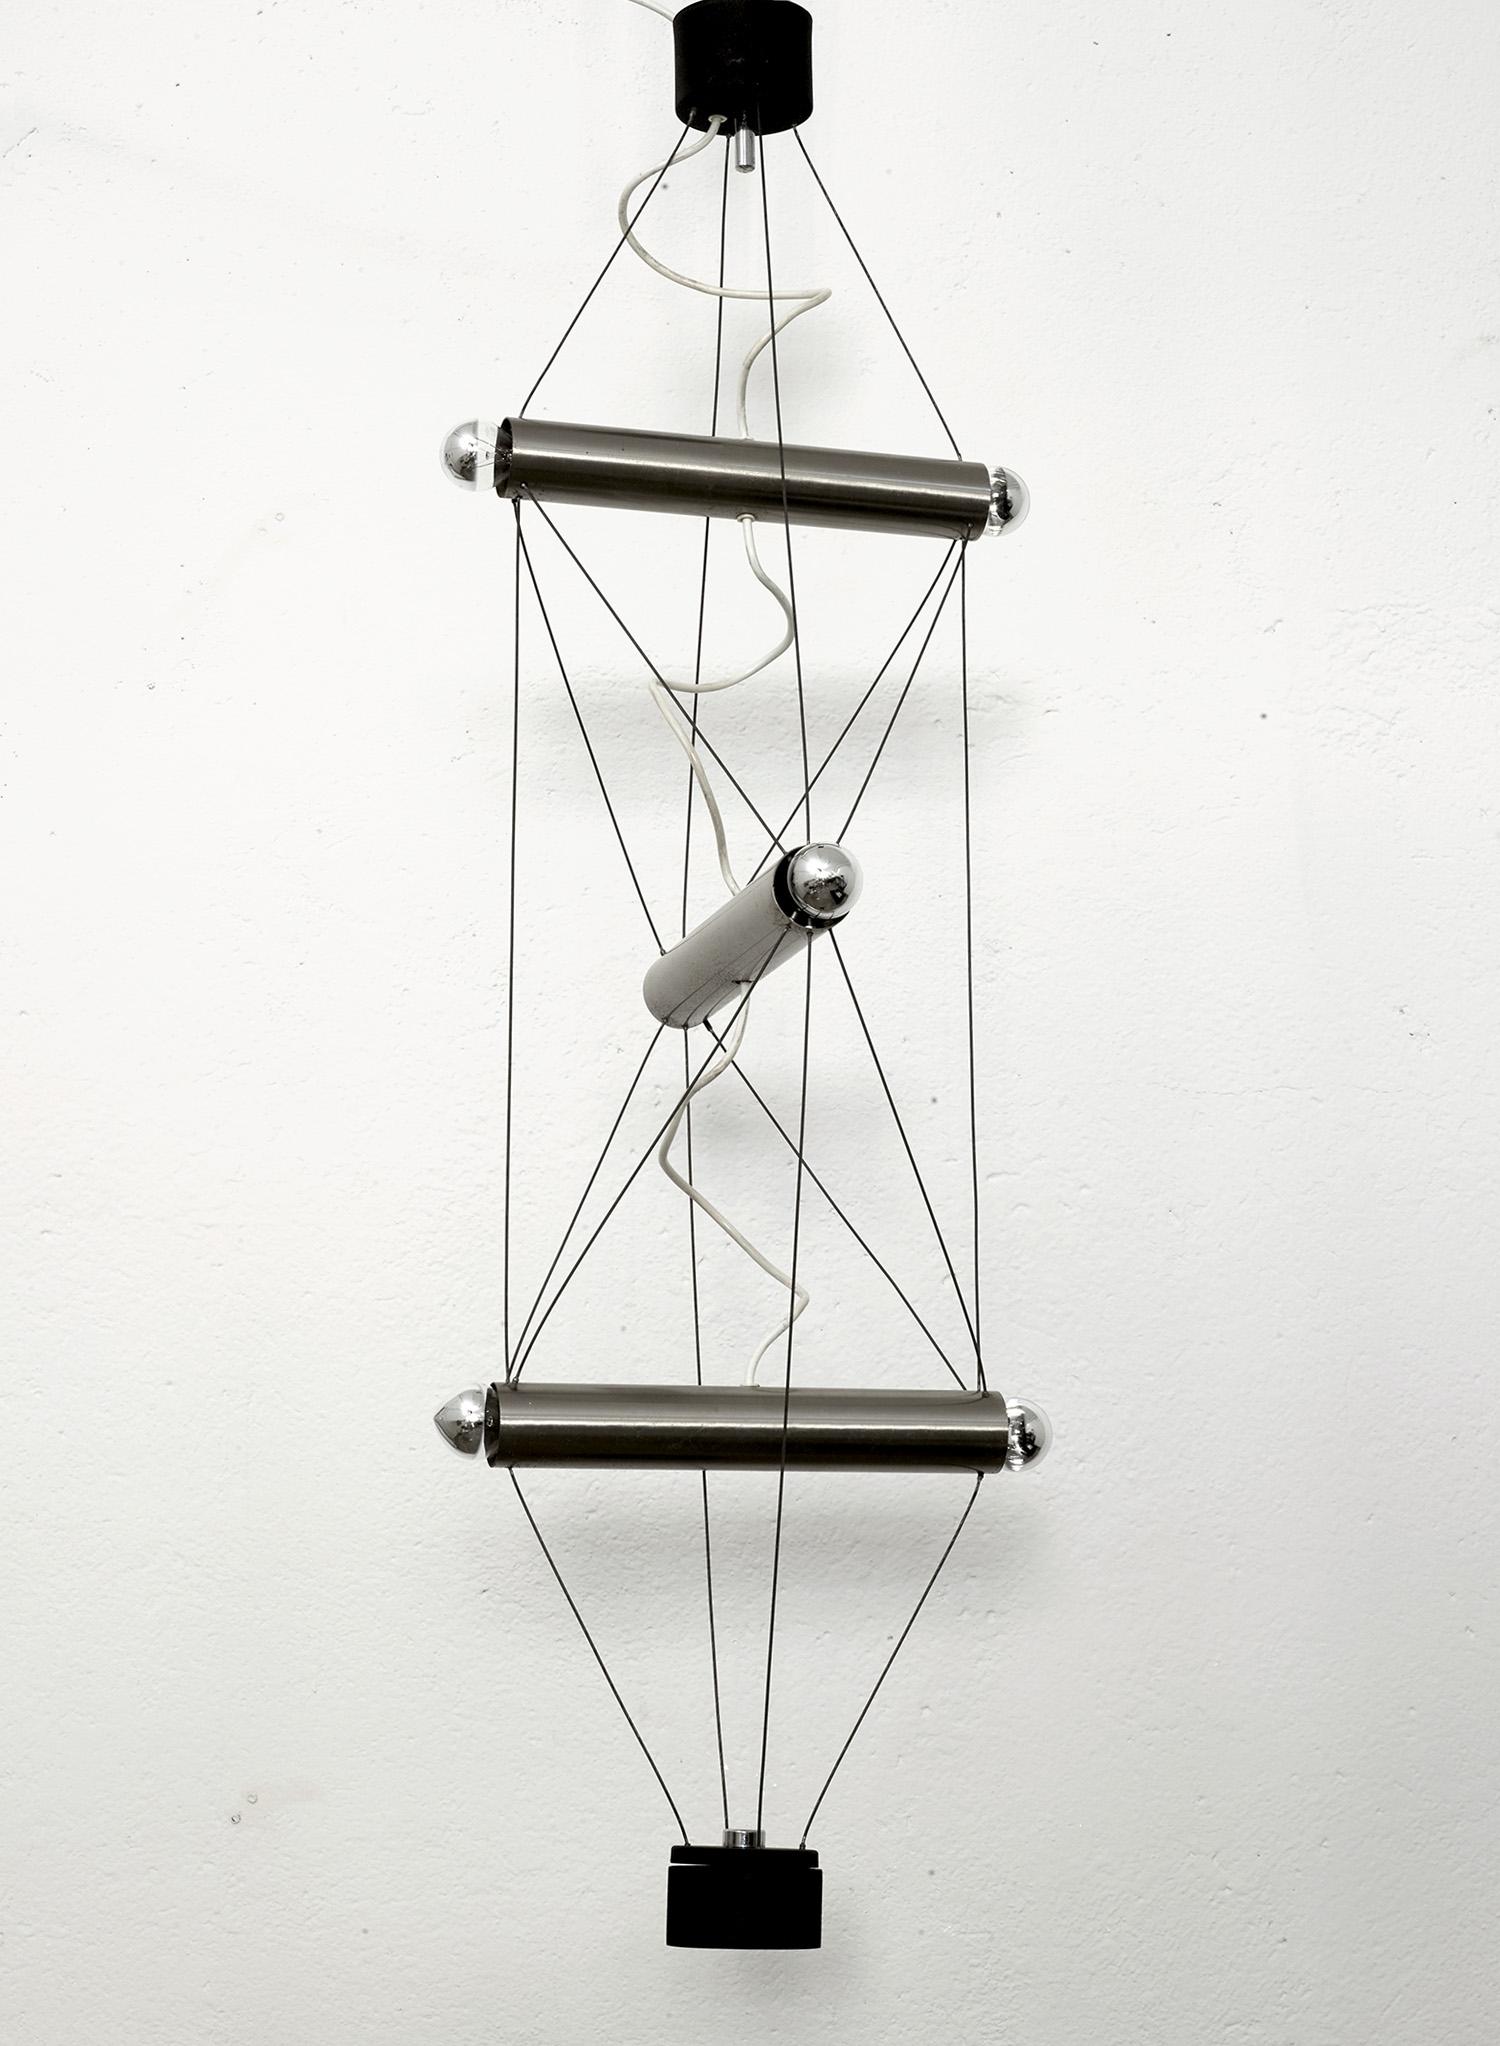 suspension-by-lumi-1970-image-05